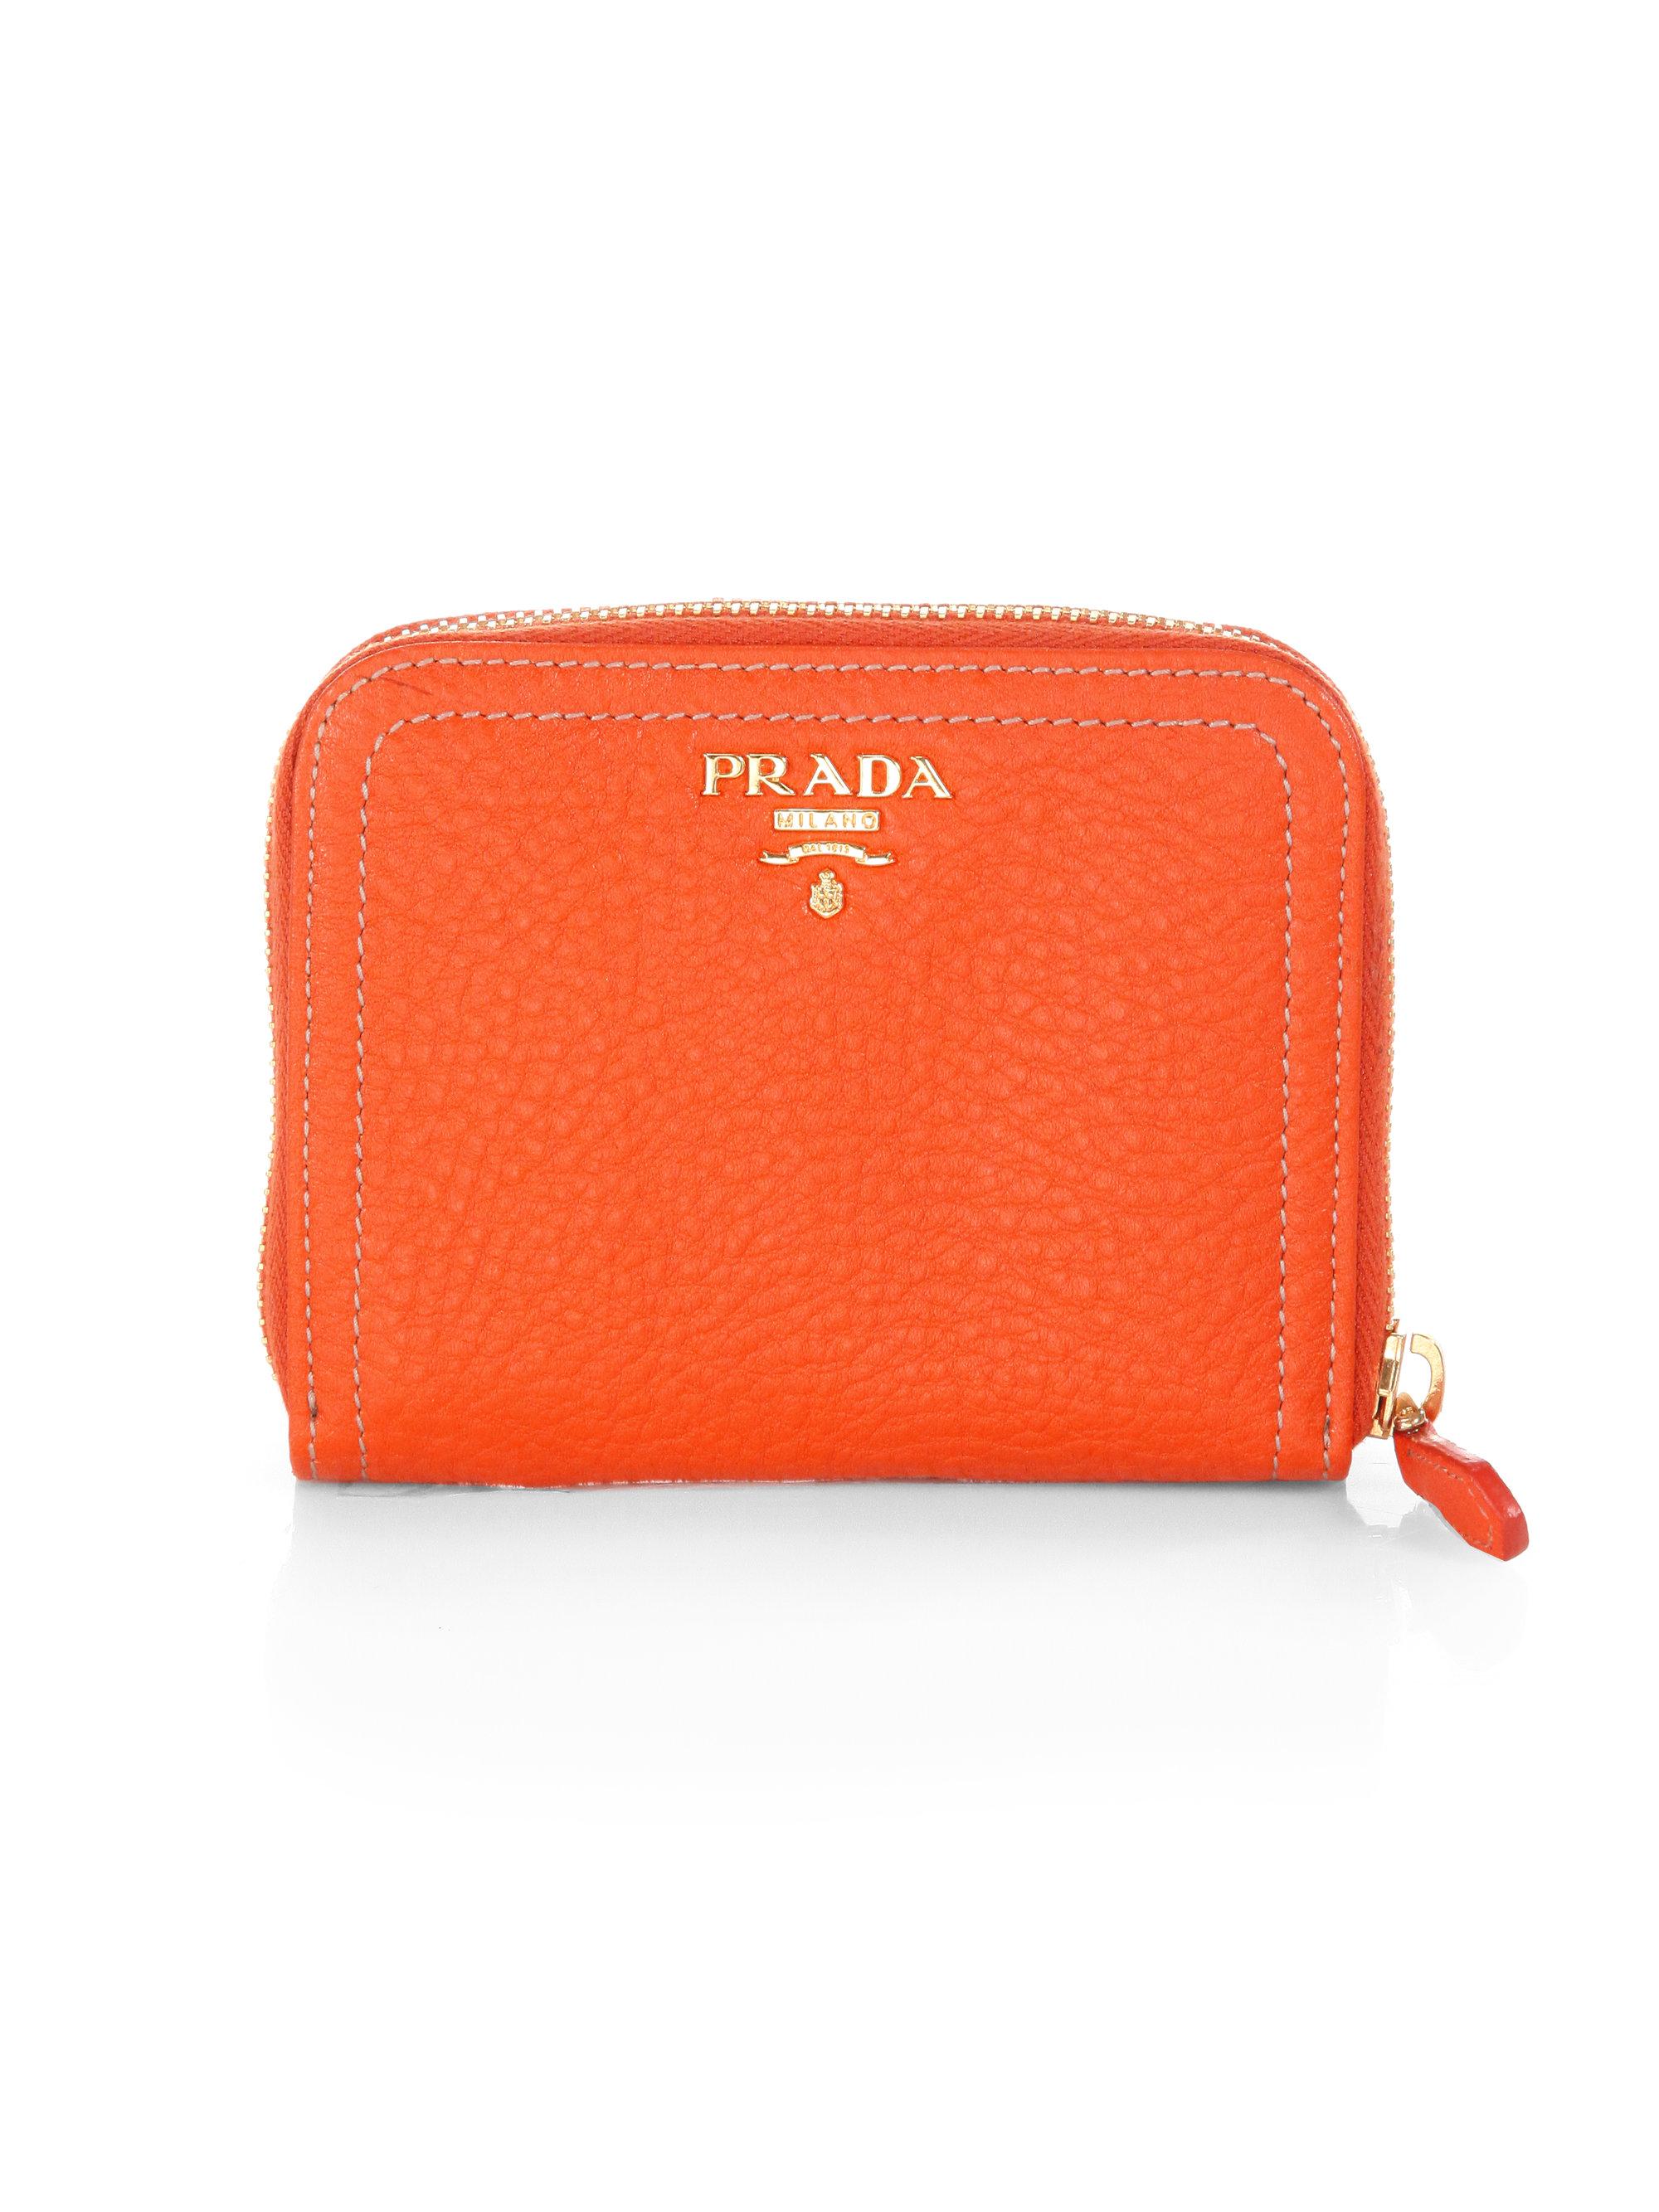 86484393 netherlands prada compact wallet 29b1f db7e8